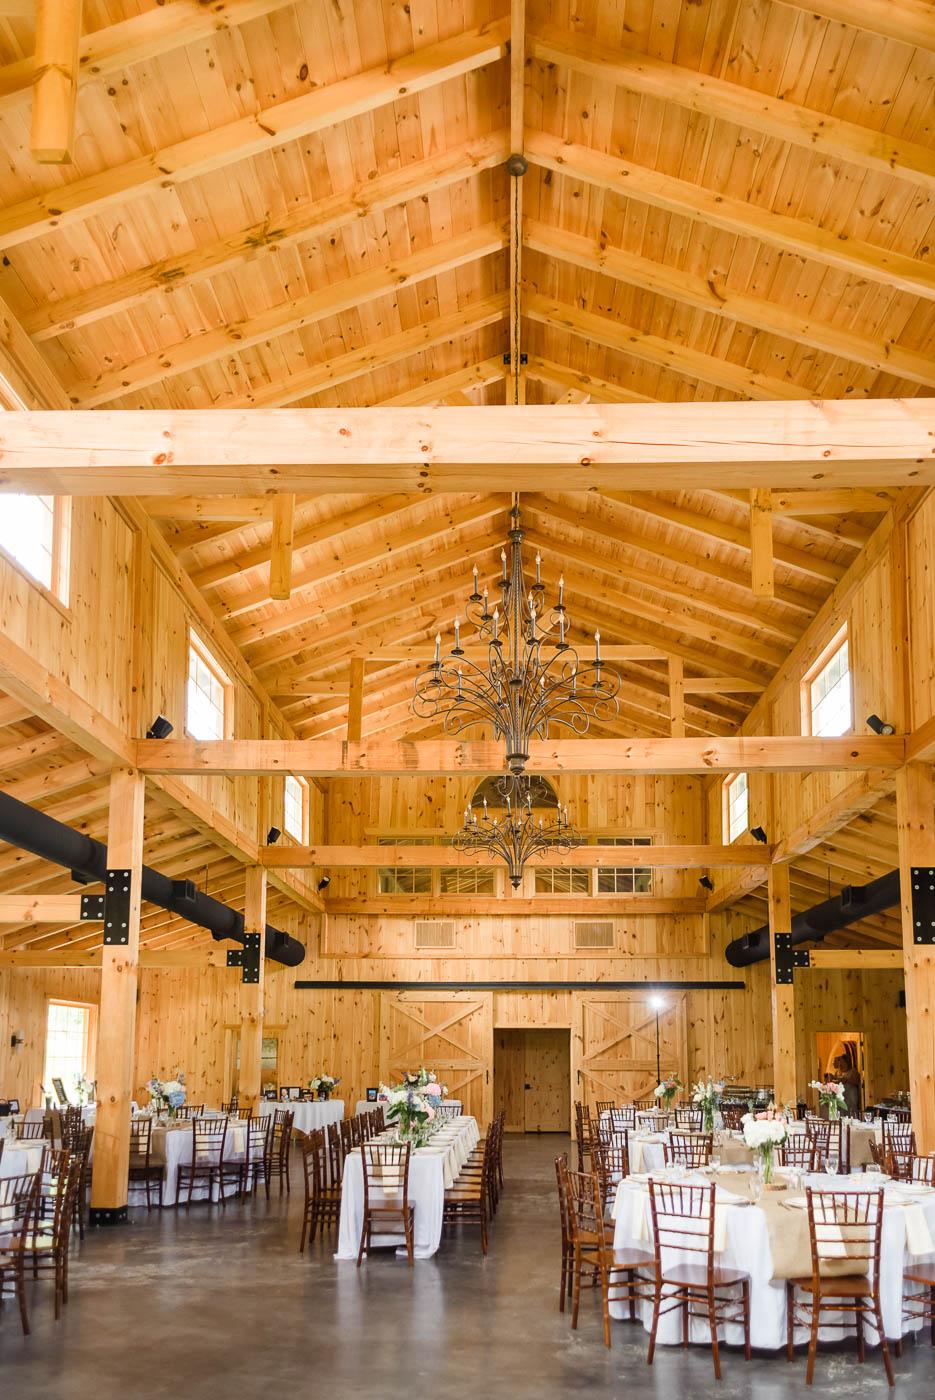 4 points farm Sevierville TN wedding venue - Nelya